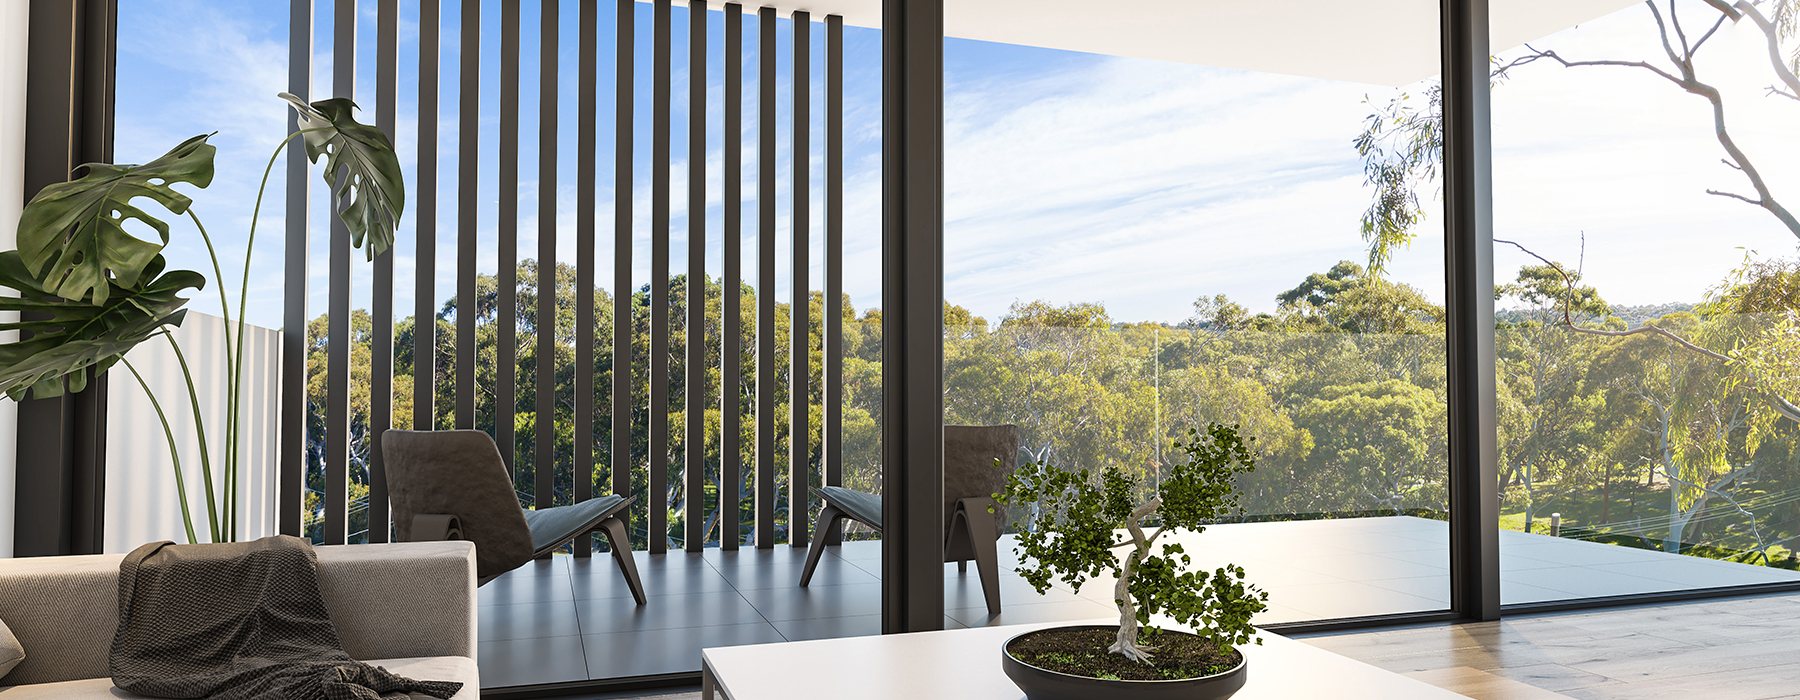 Aurora Cronulla Interior Livingroom views balcony